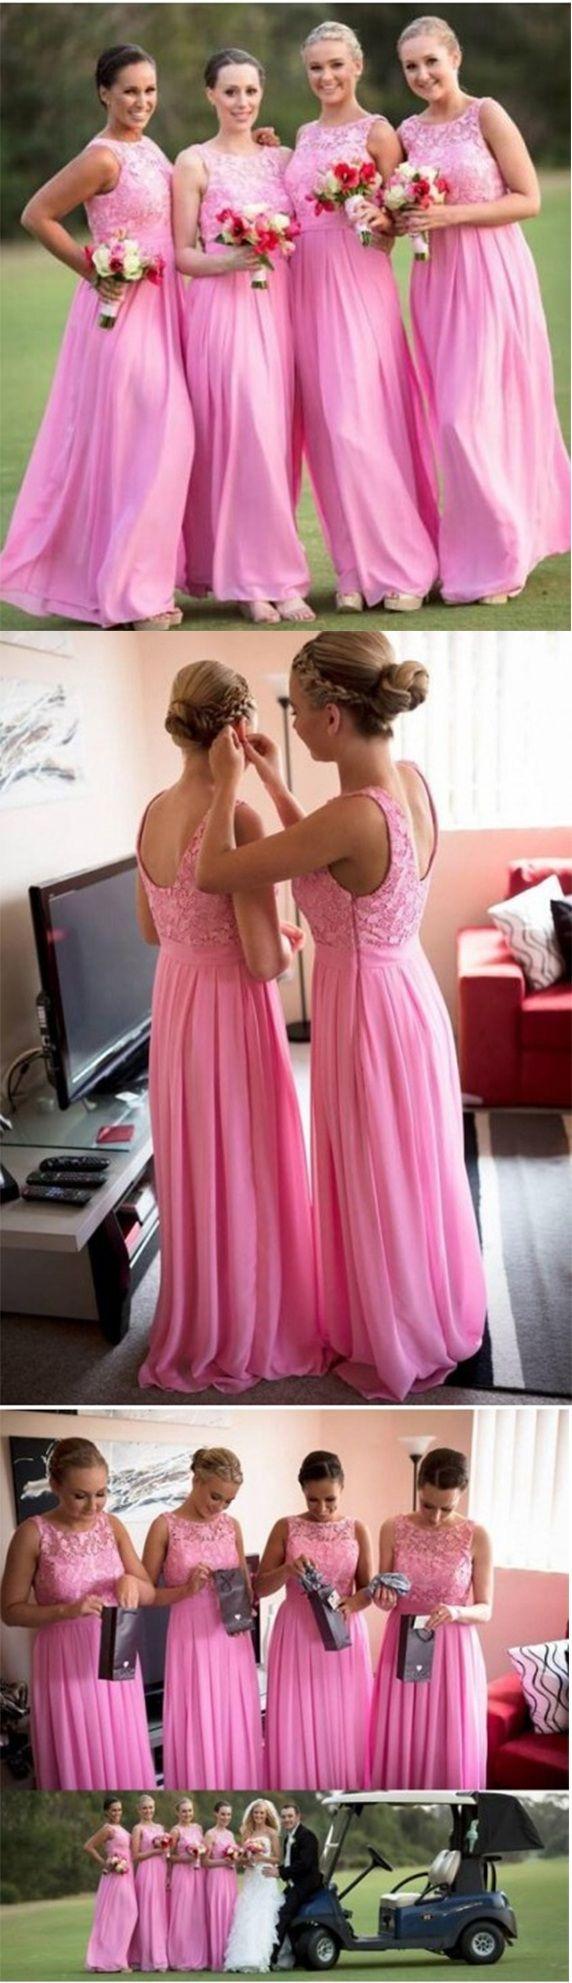 37 best Bridesmaid Dresses images on Pinterest | Prom dresses, Ball ...